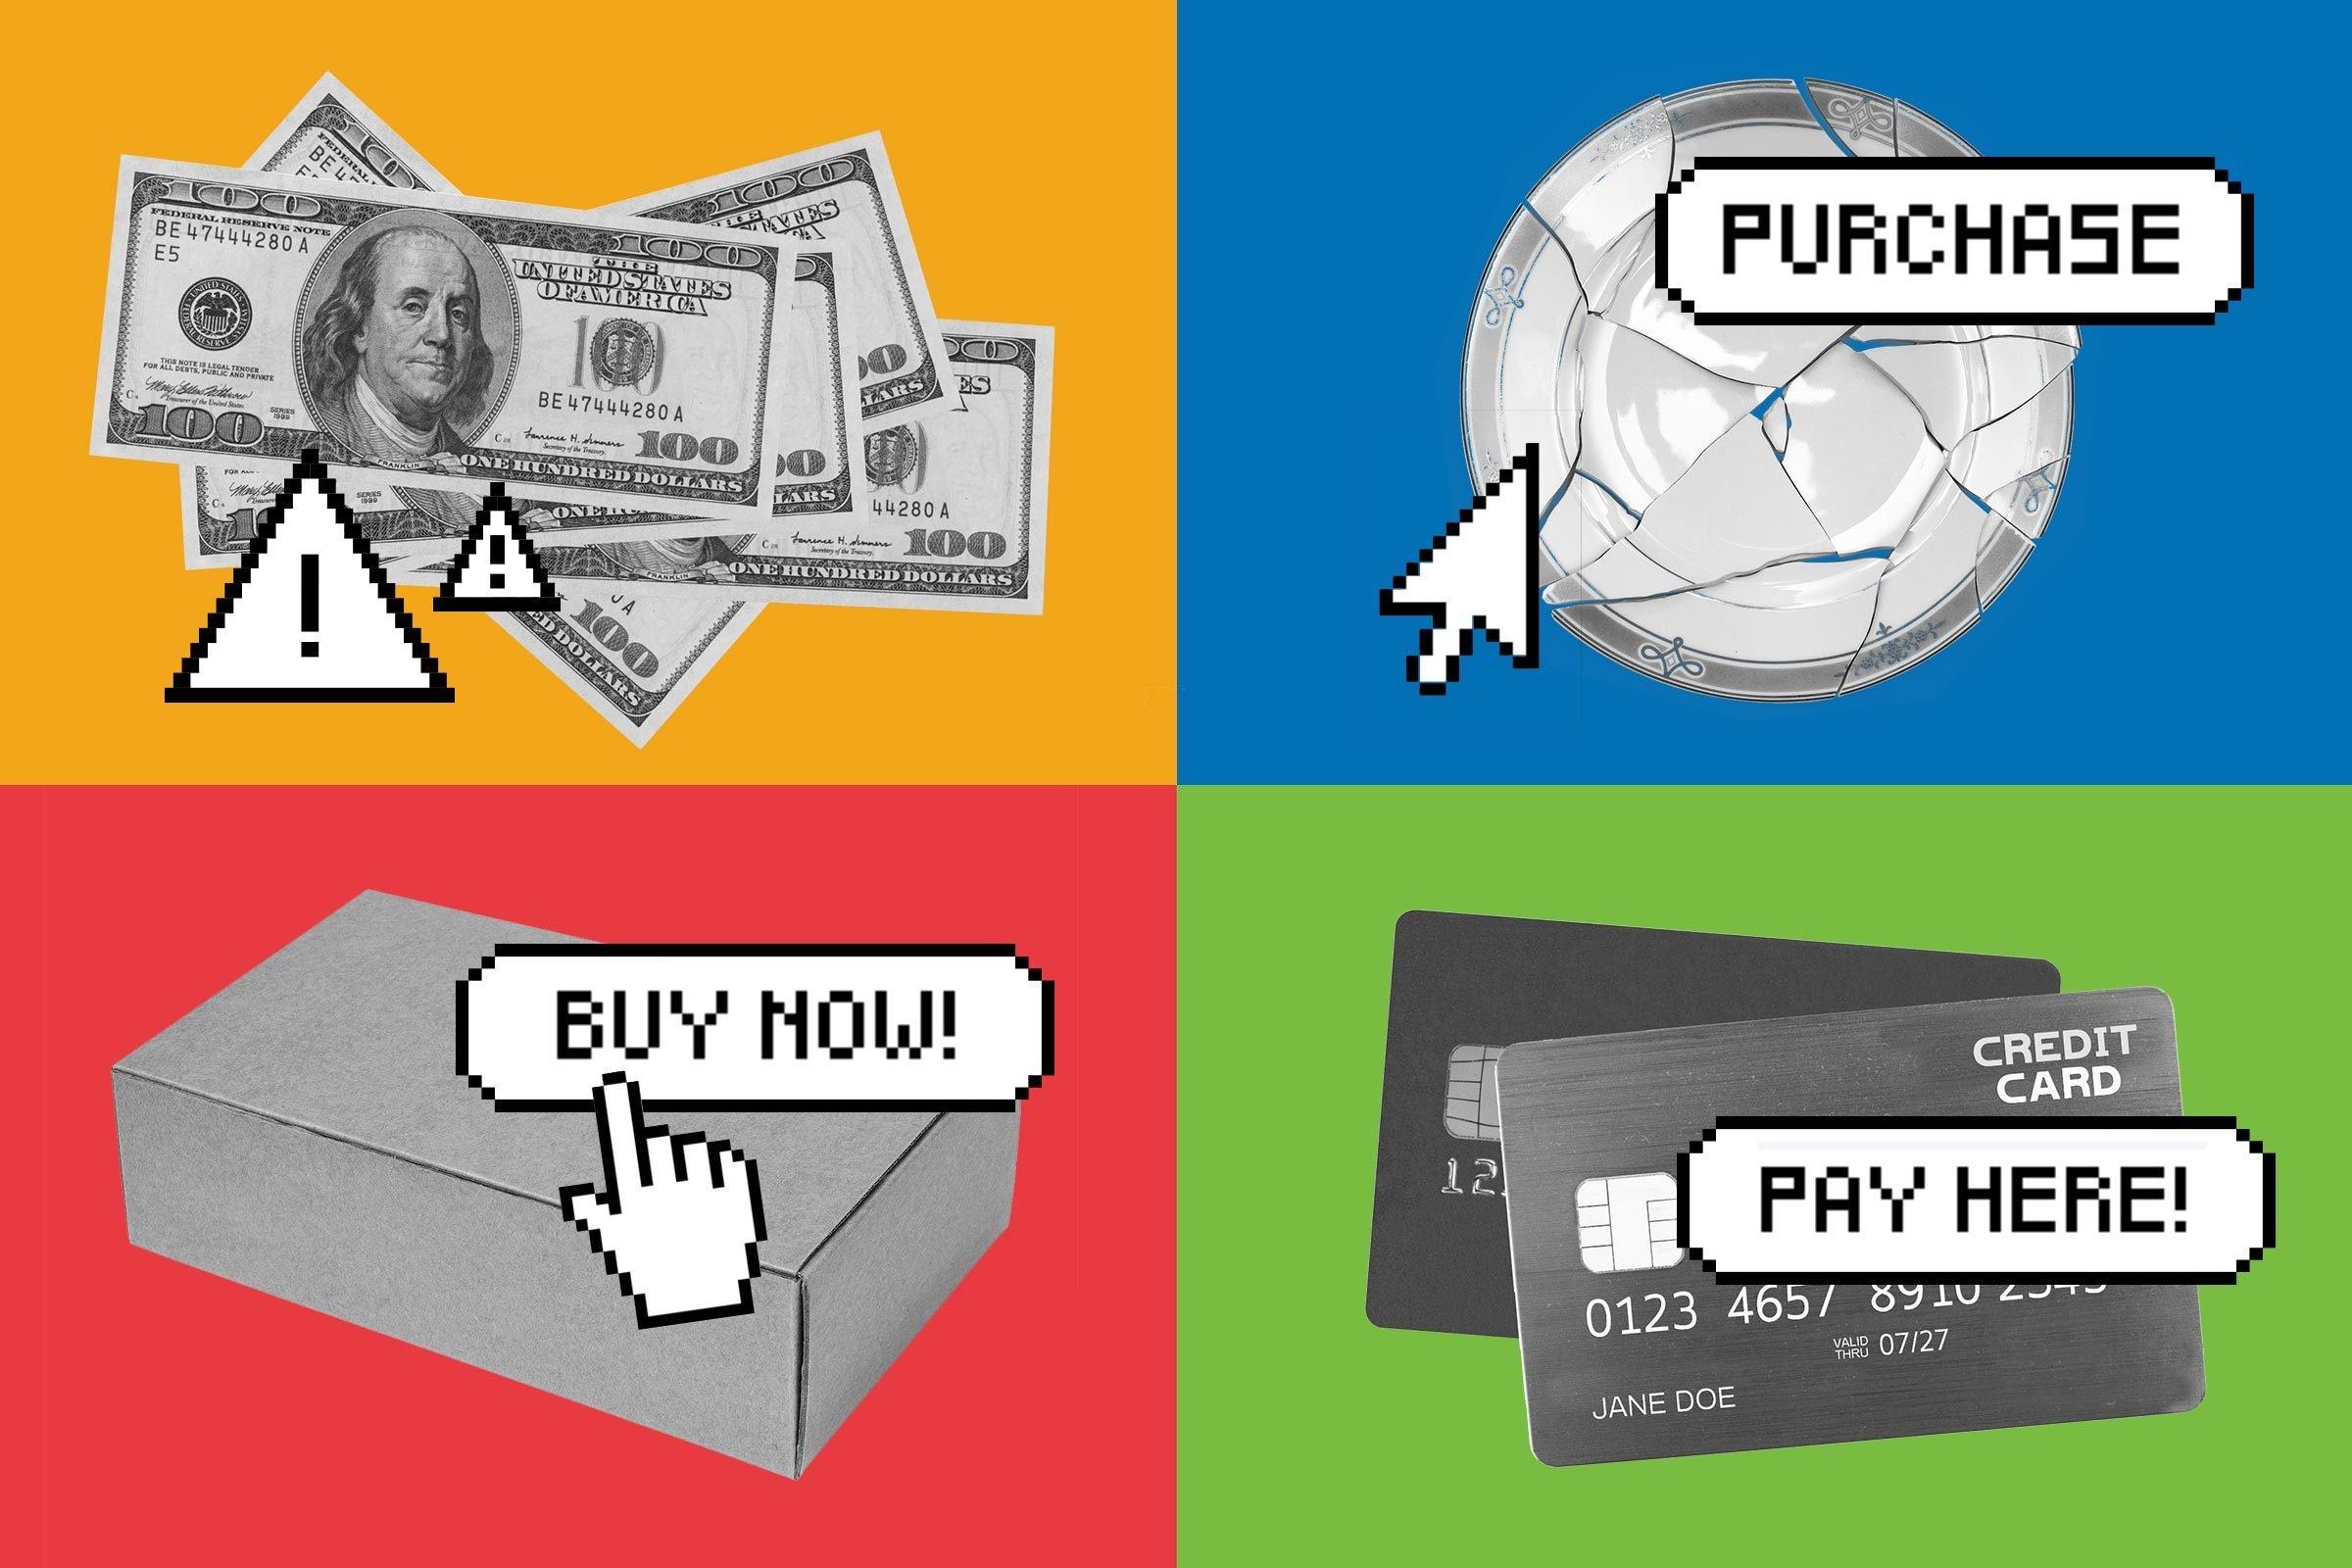 Collage of ebay goods